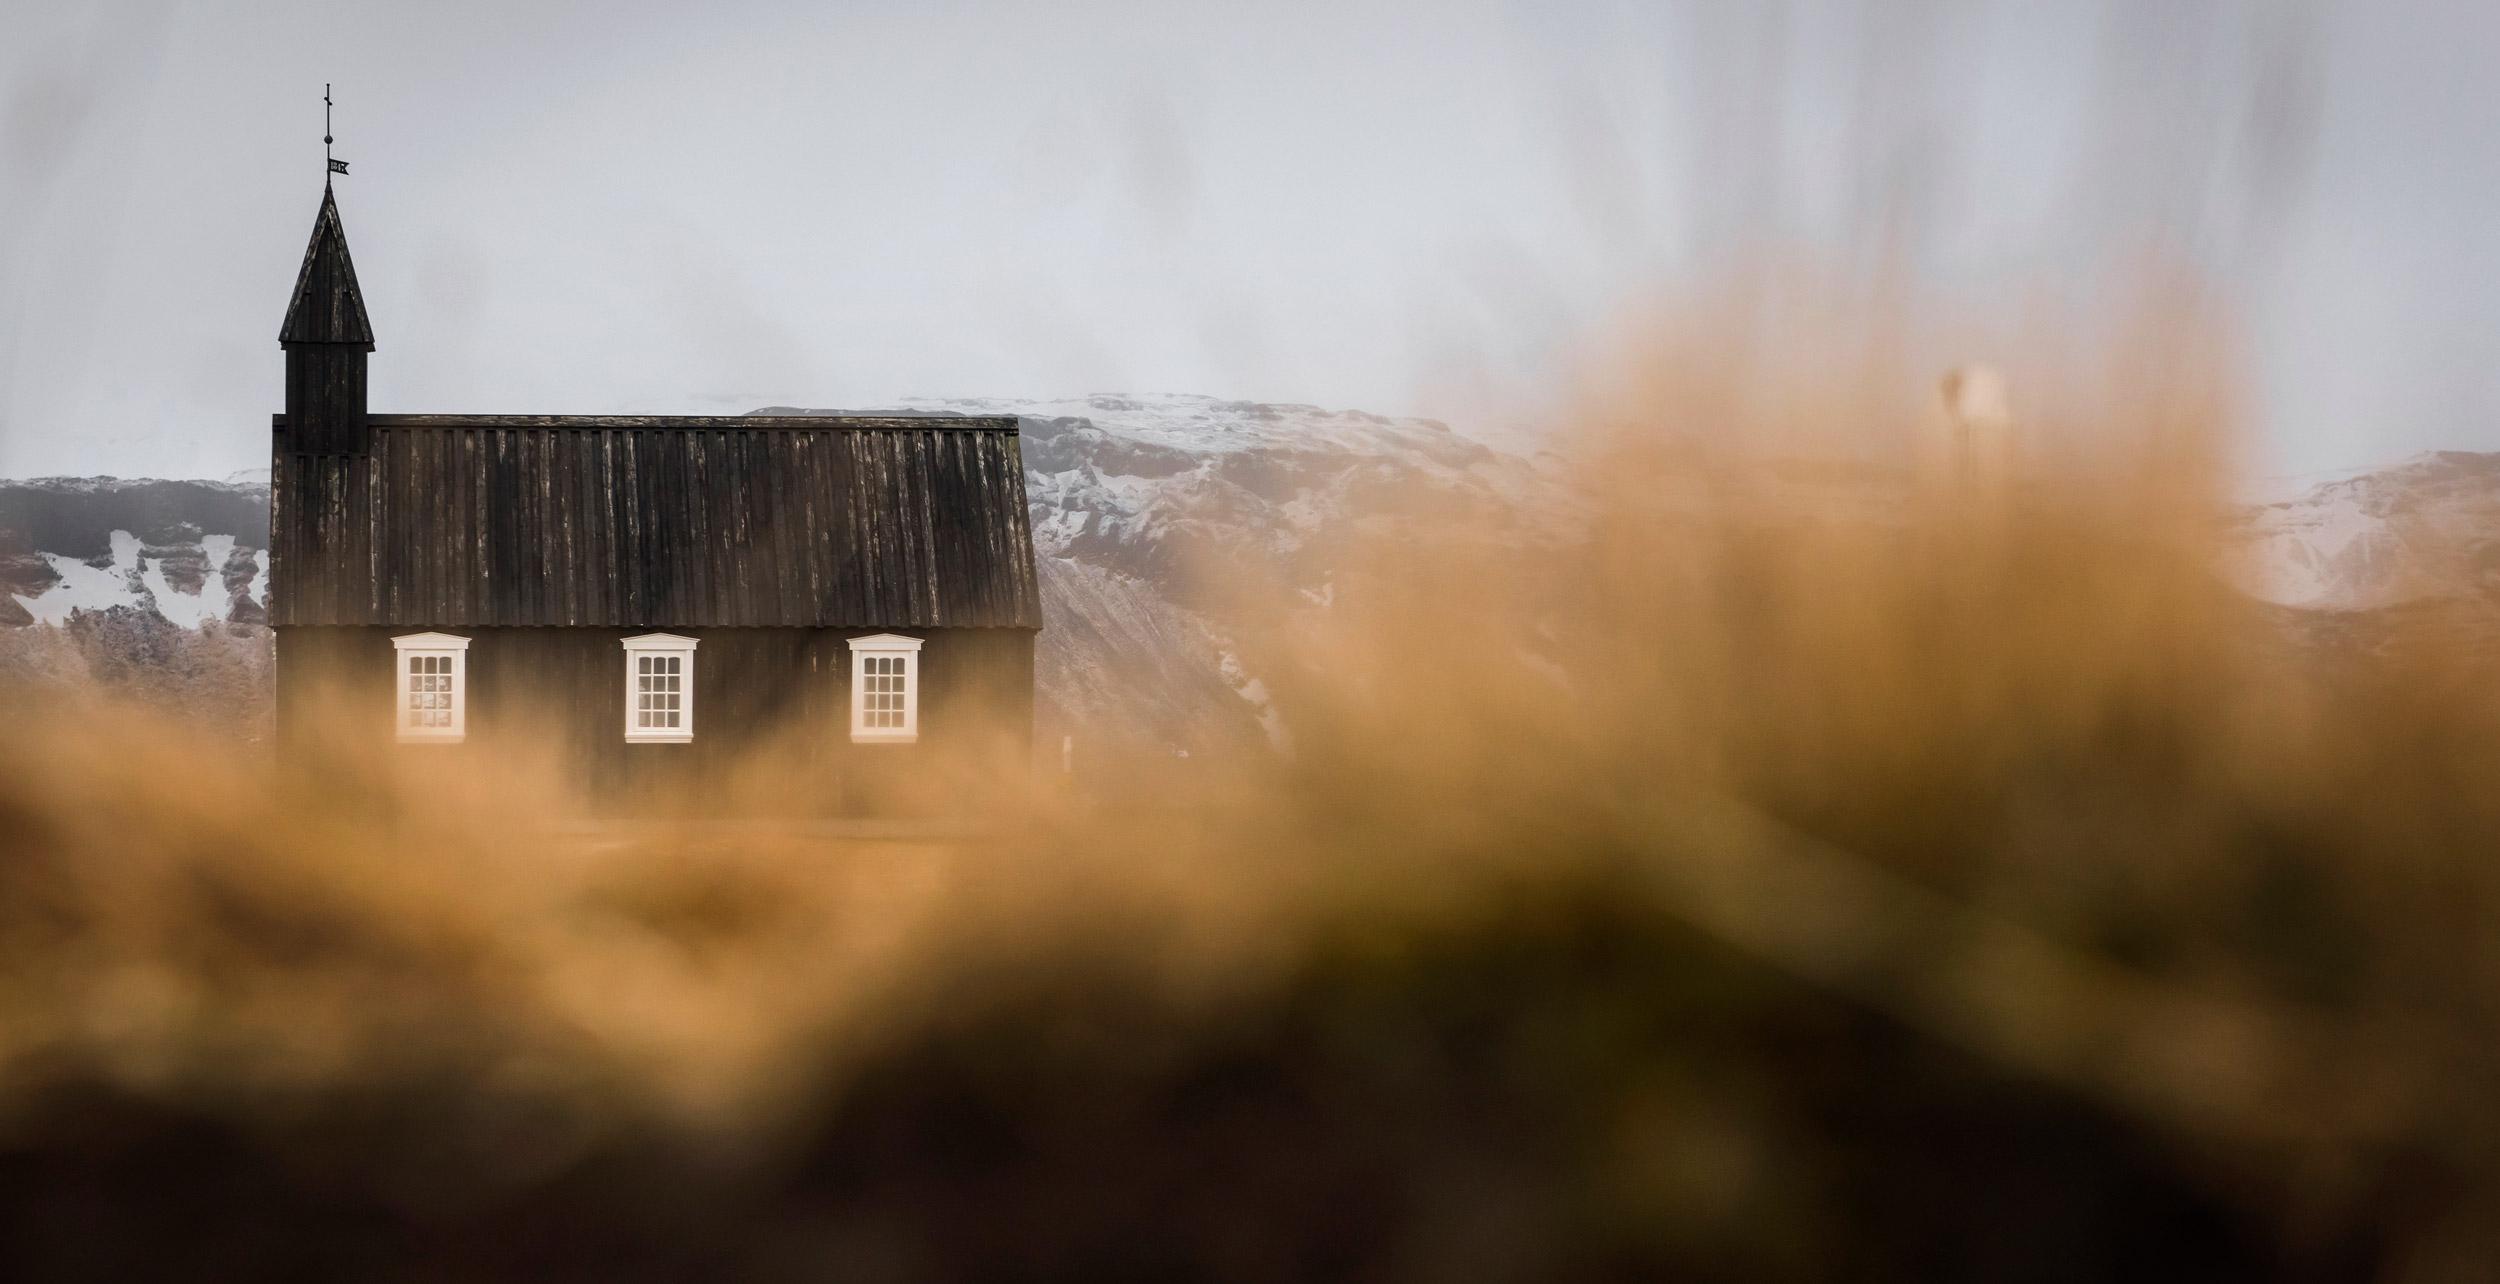 Voyage_Islande_Hiver_Anouk-Ruffieux_16.jpg